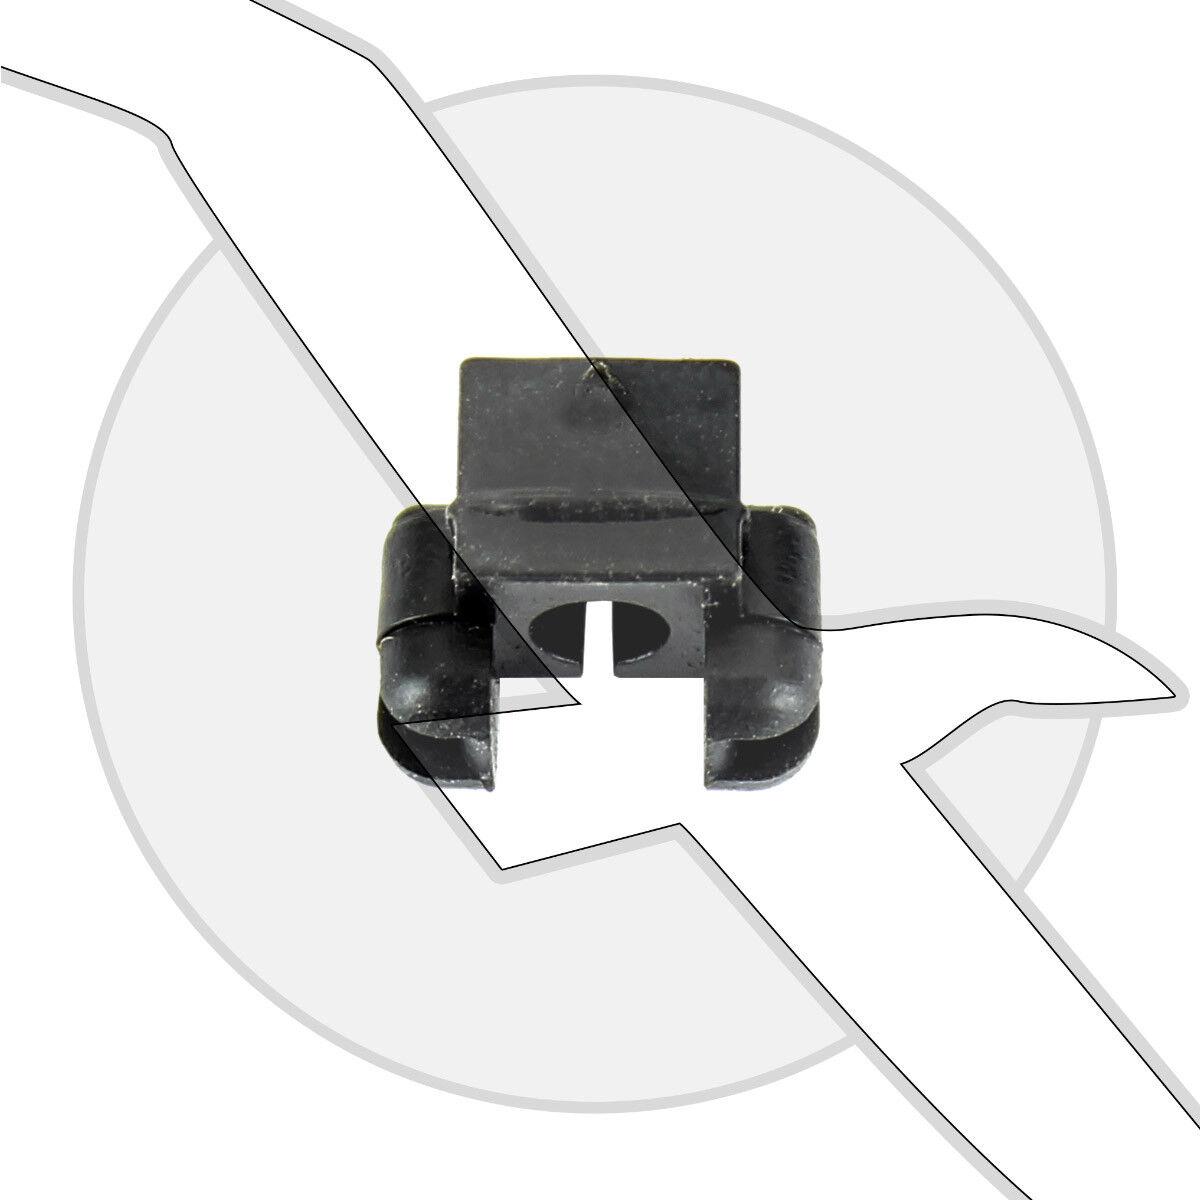 New Mercury Quicksilver Plastic Grommet 25-33666 //1 each